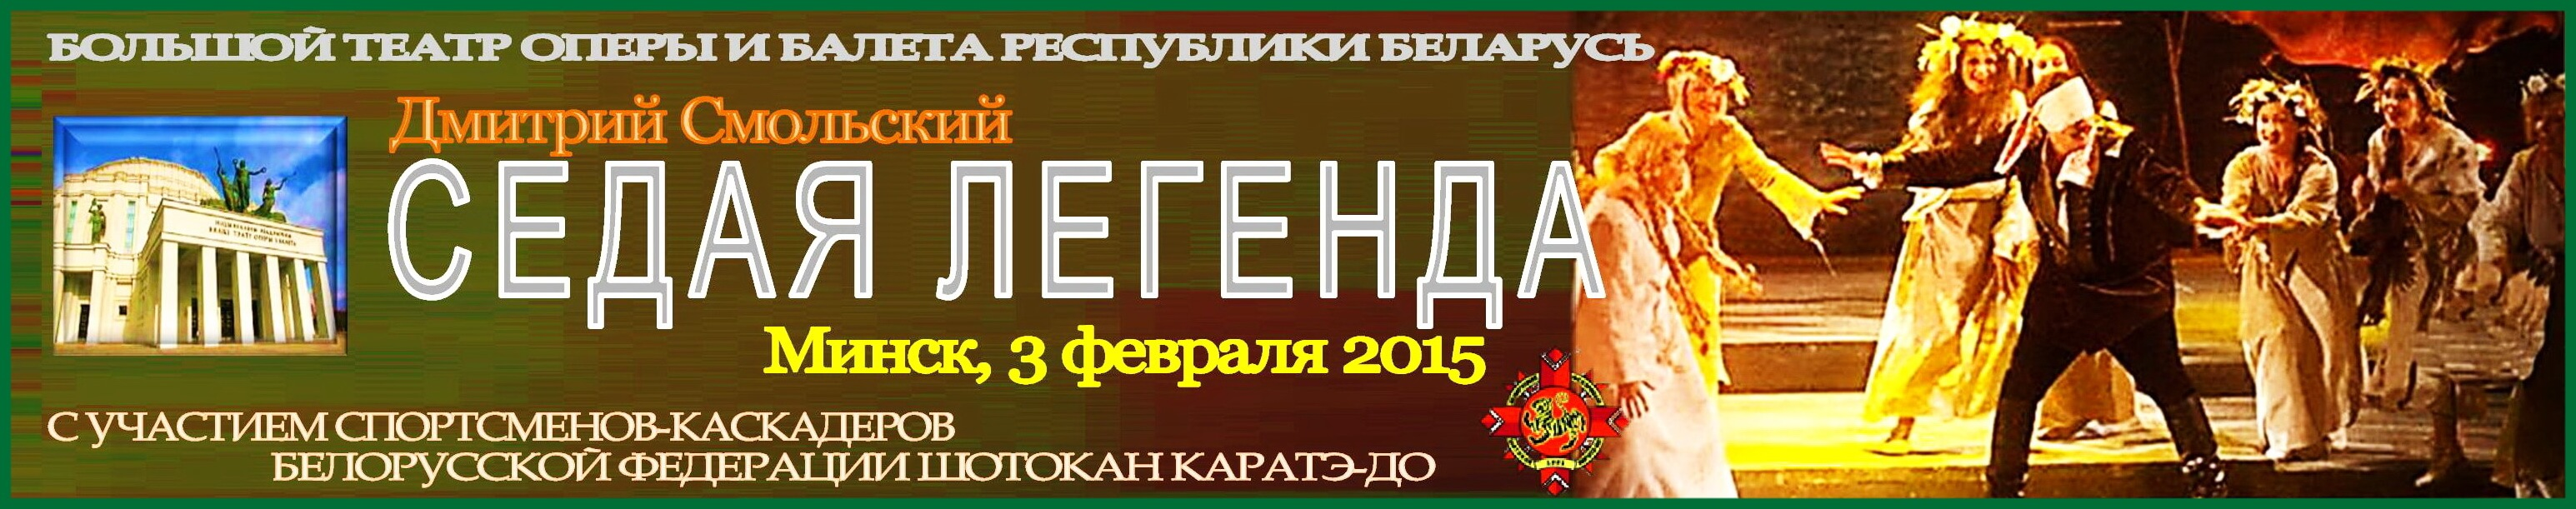 Седая легенда 2015-02 Баннер